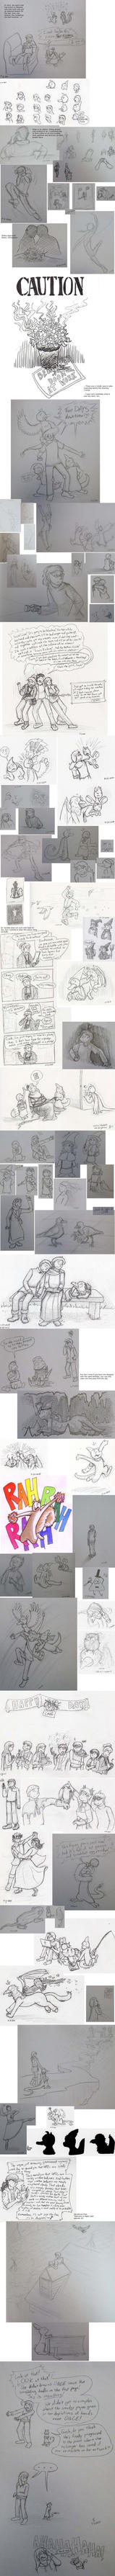 Sketchbook Spam '13-'15, Part 2 by Between-the-Stars